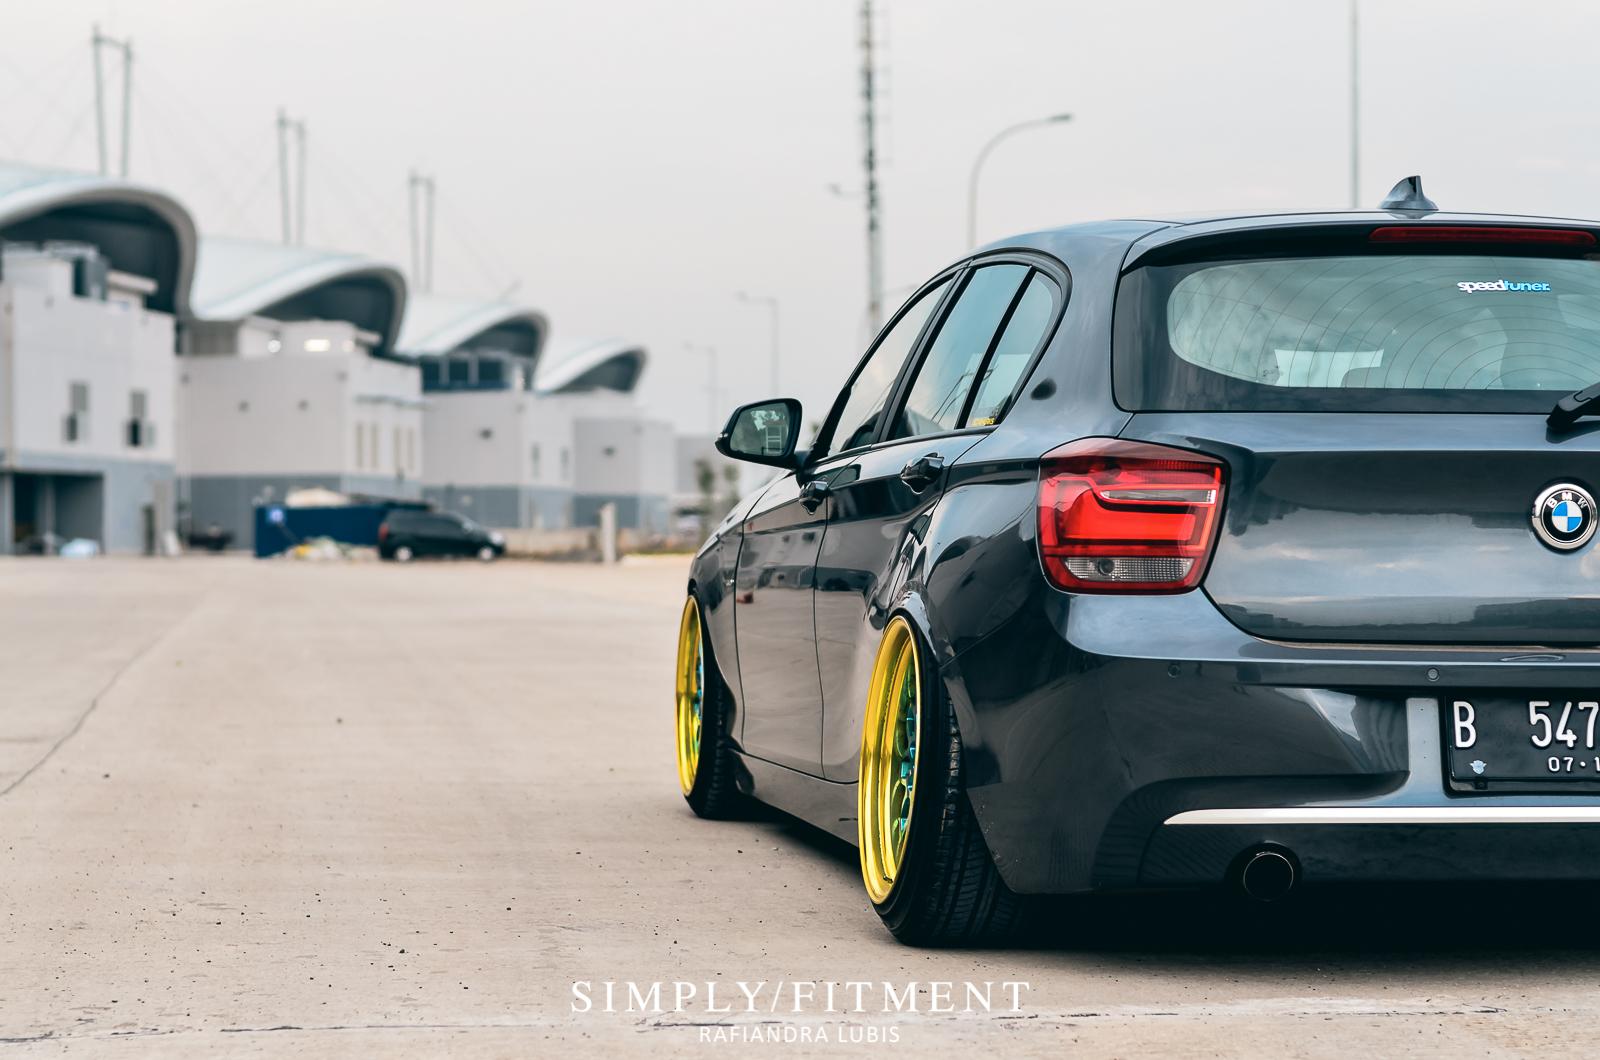 FRIDO'S BMW F20 ON WORK SEEKER CX